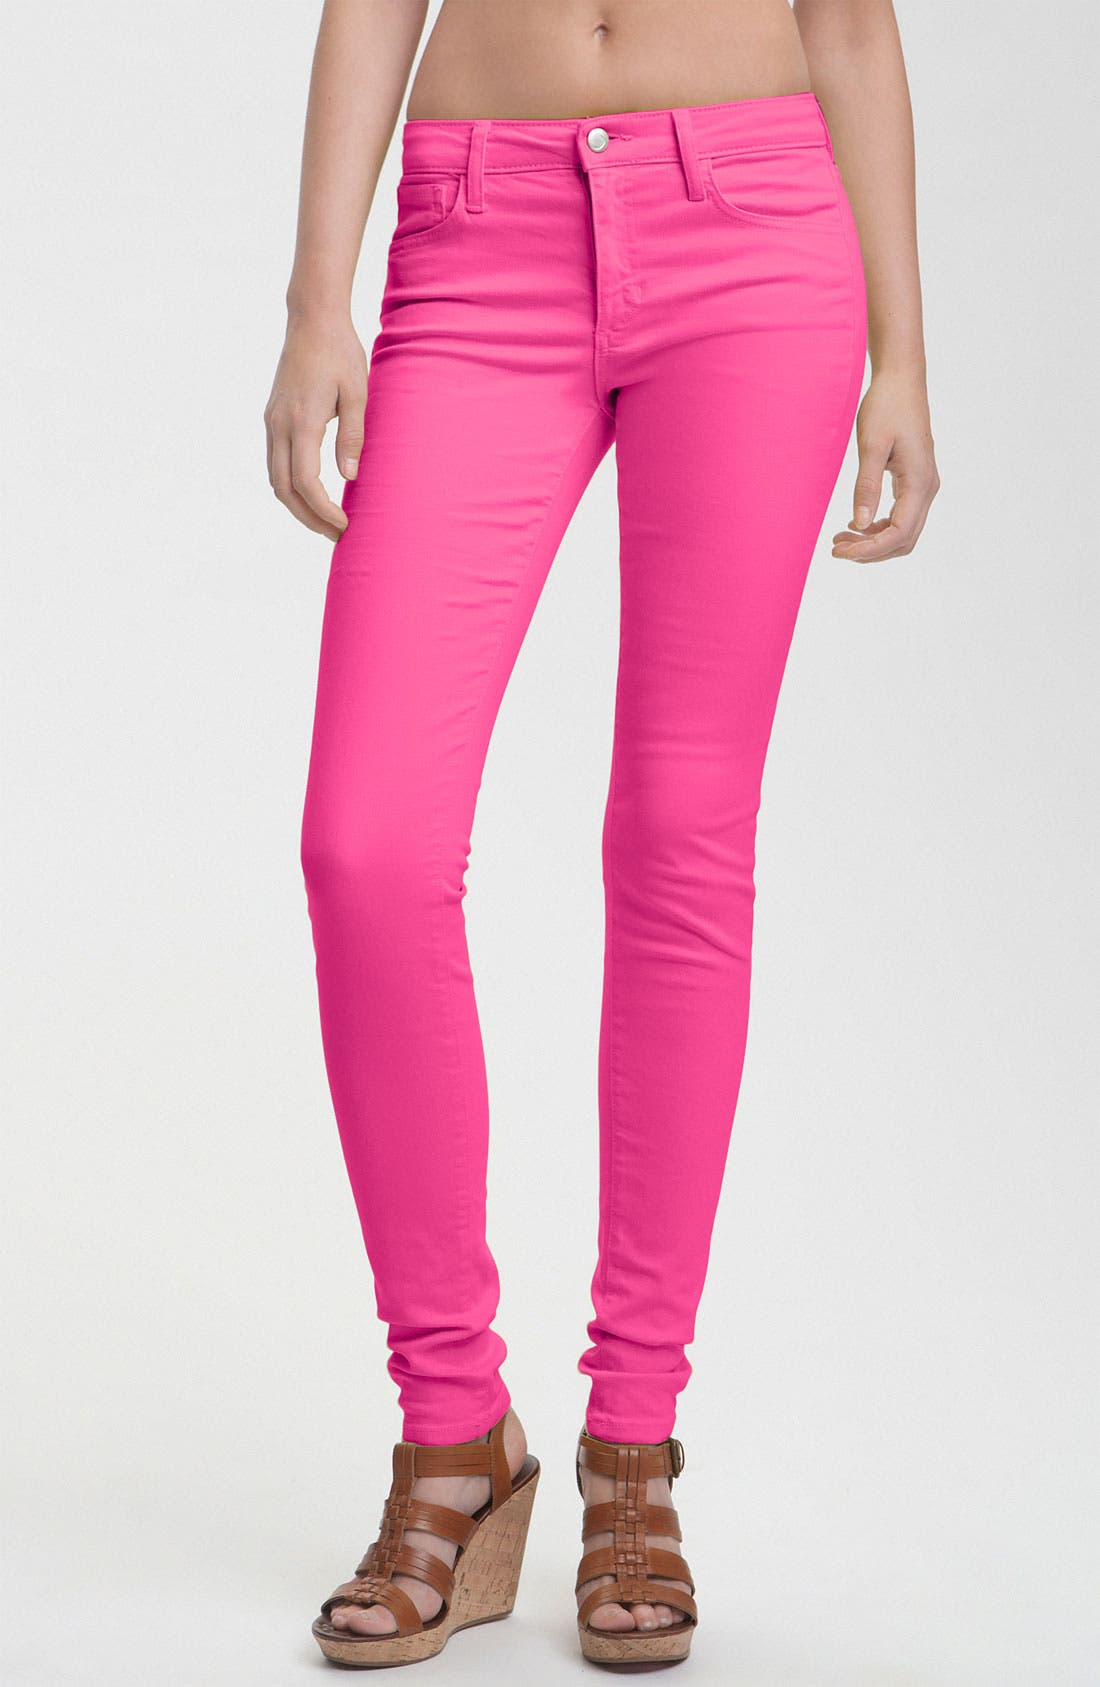 Alternate Image 1 Selected - Joe's Skinny Stretch Jeans (Pink Glo)